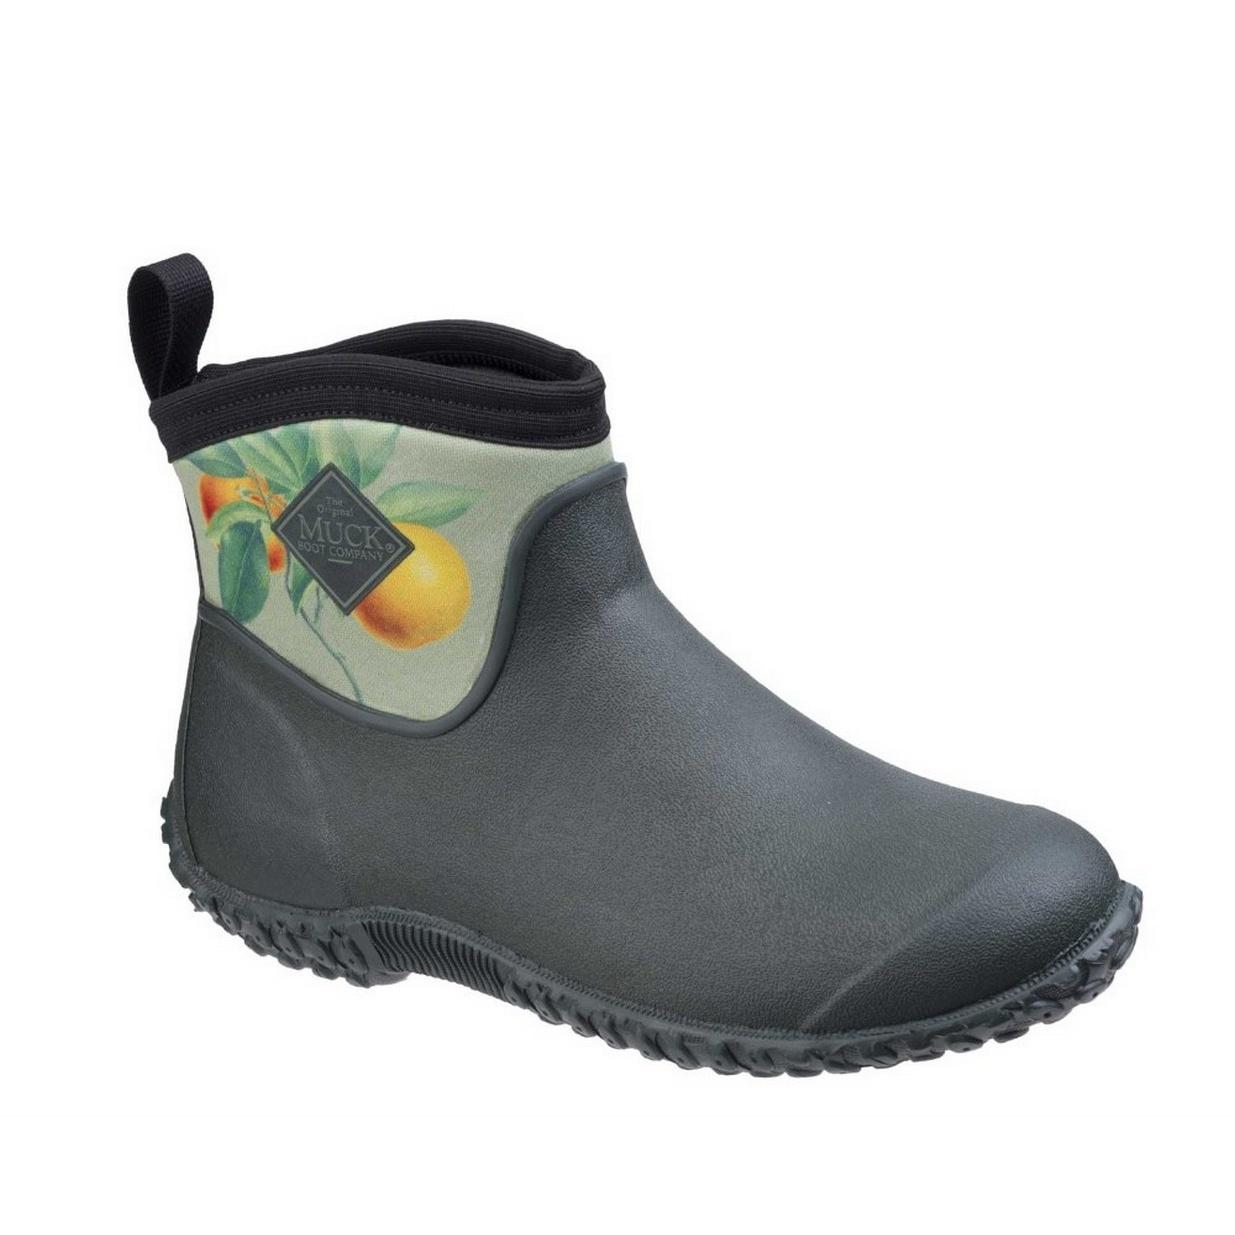 Muck Boots Womens/Ladies Muckster II Ankle RHS Gardening Shoes (3 UK) (Green/Citrus-Aurantium)